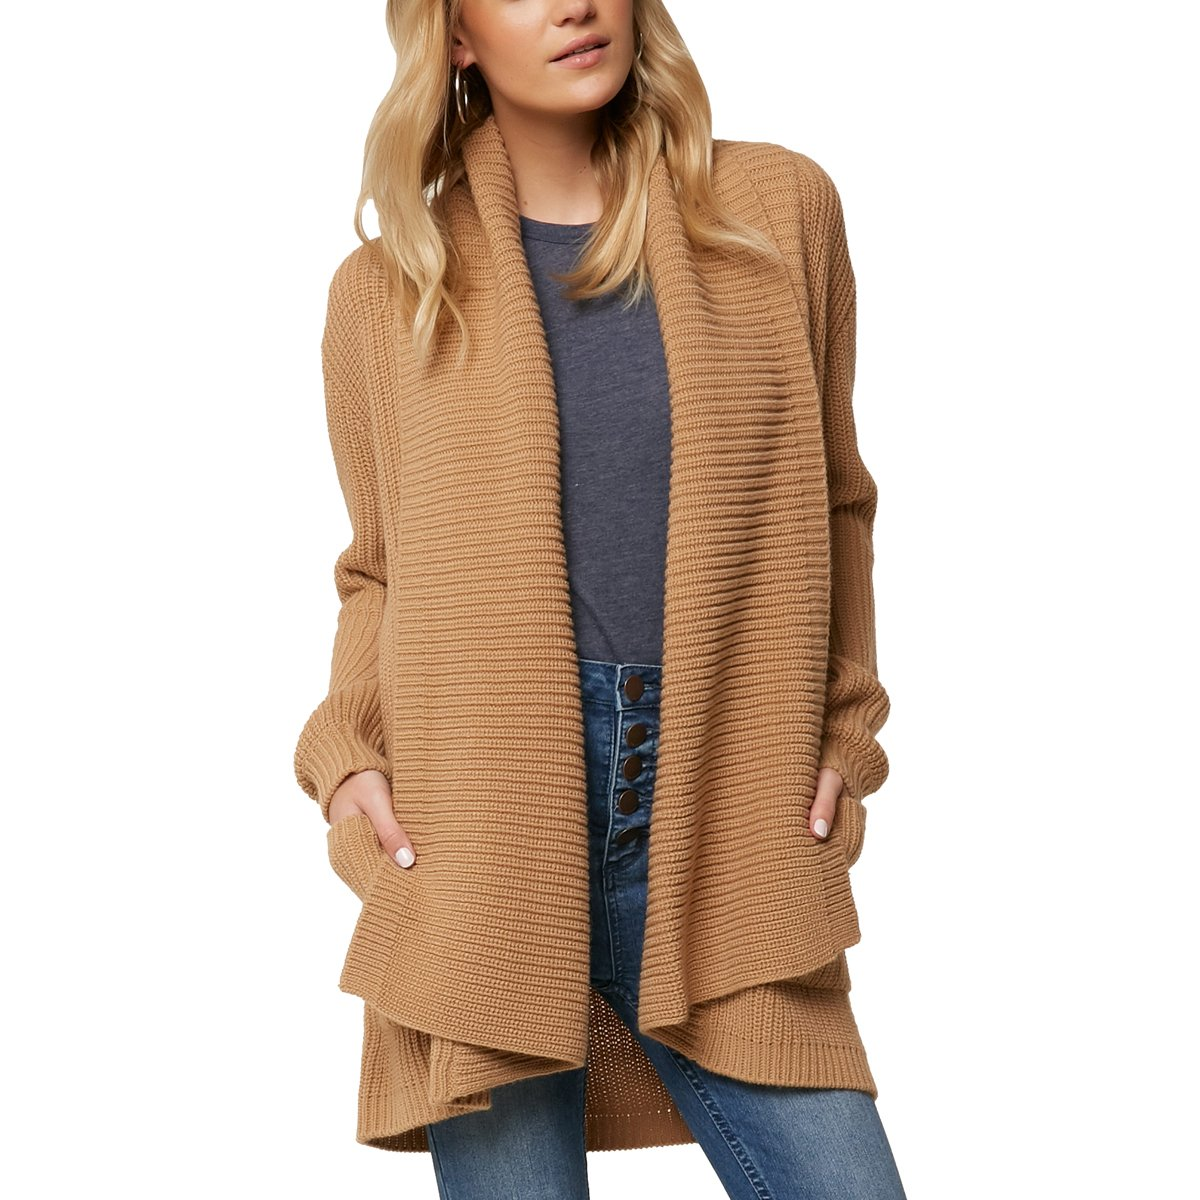 O'Neill Women's Galley Cardigan Sweater, Camel, L